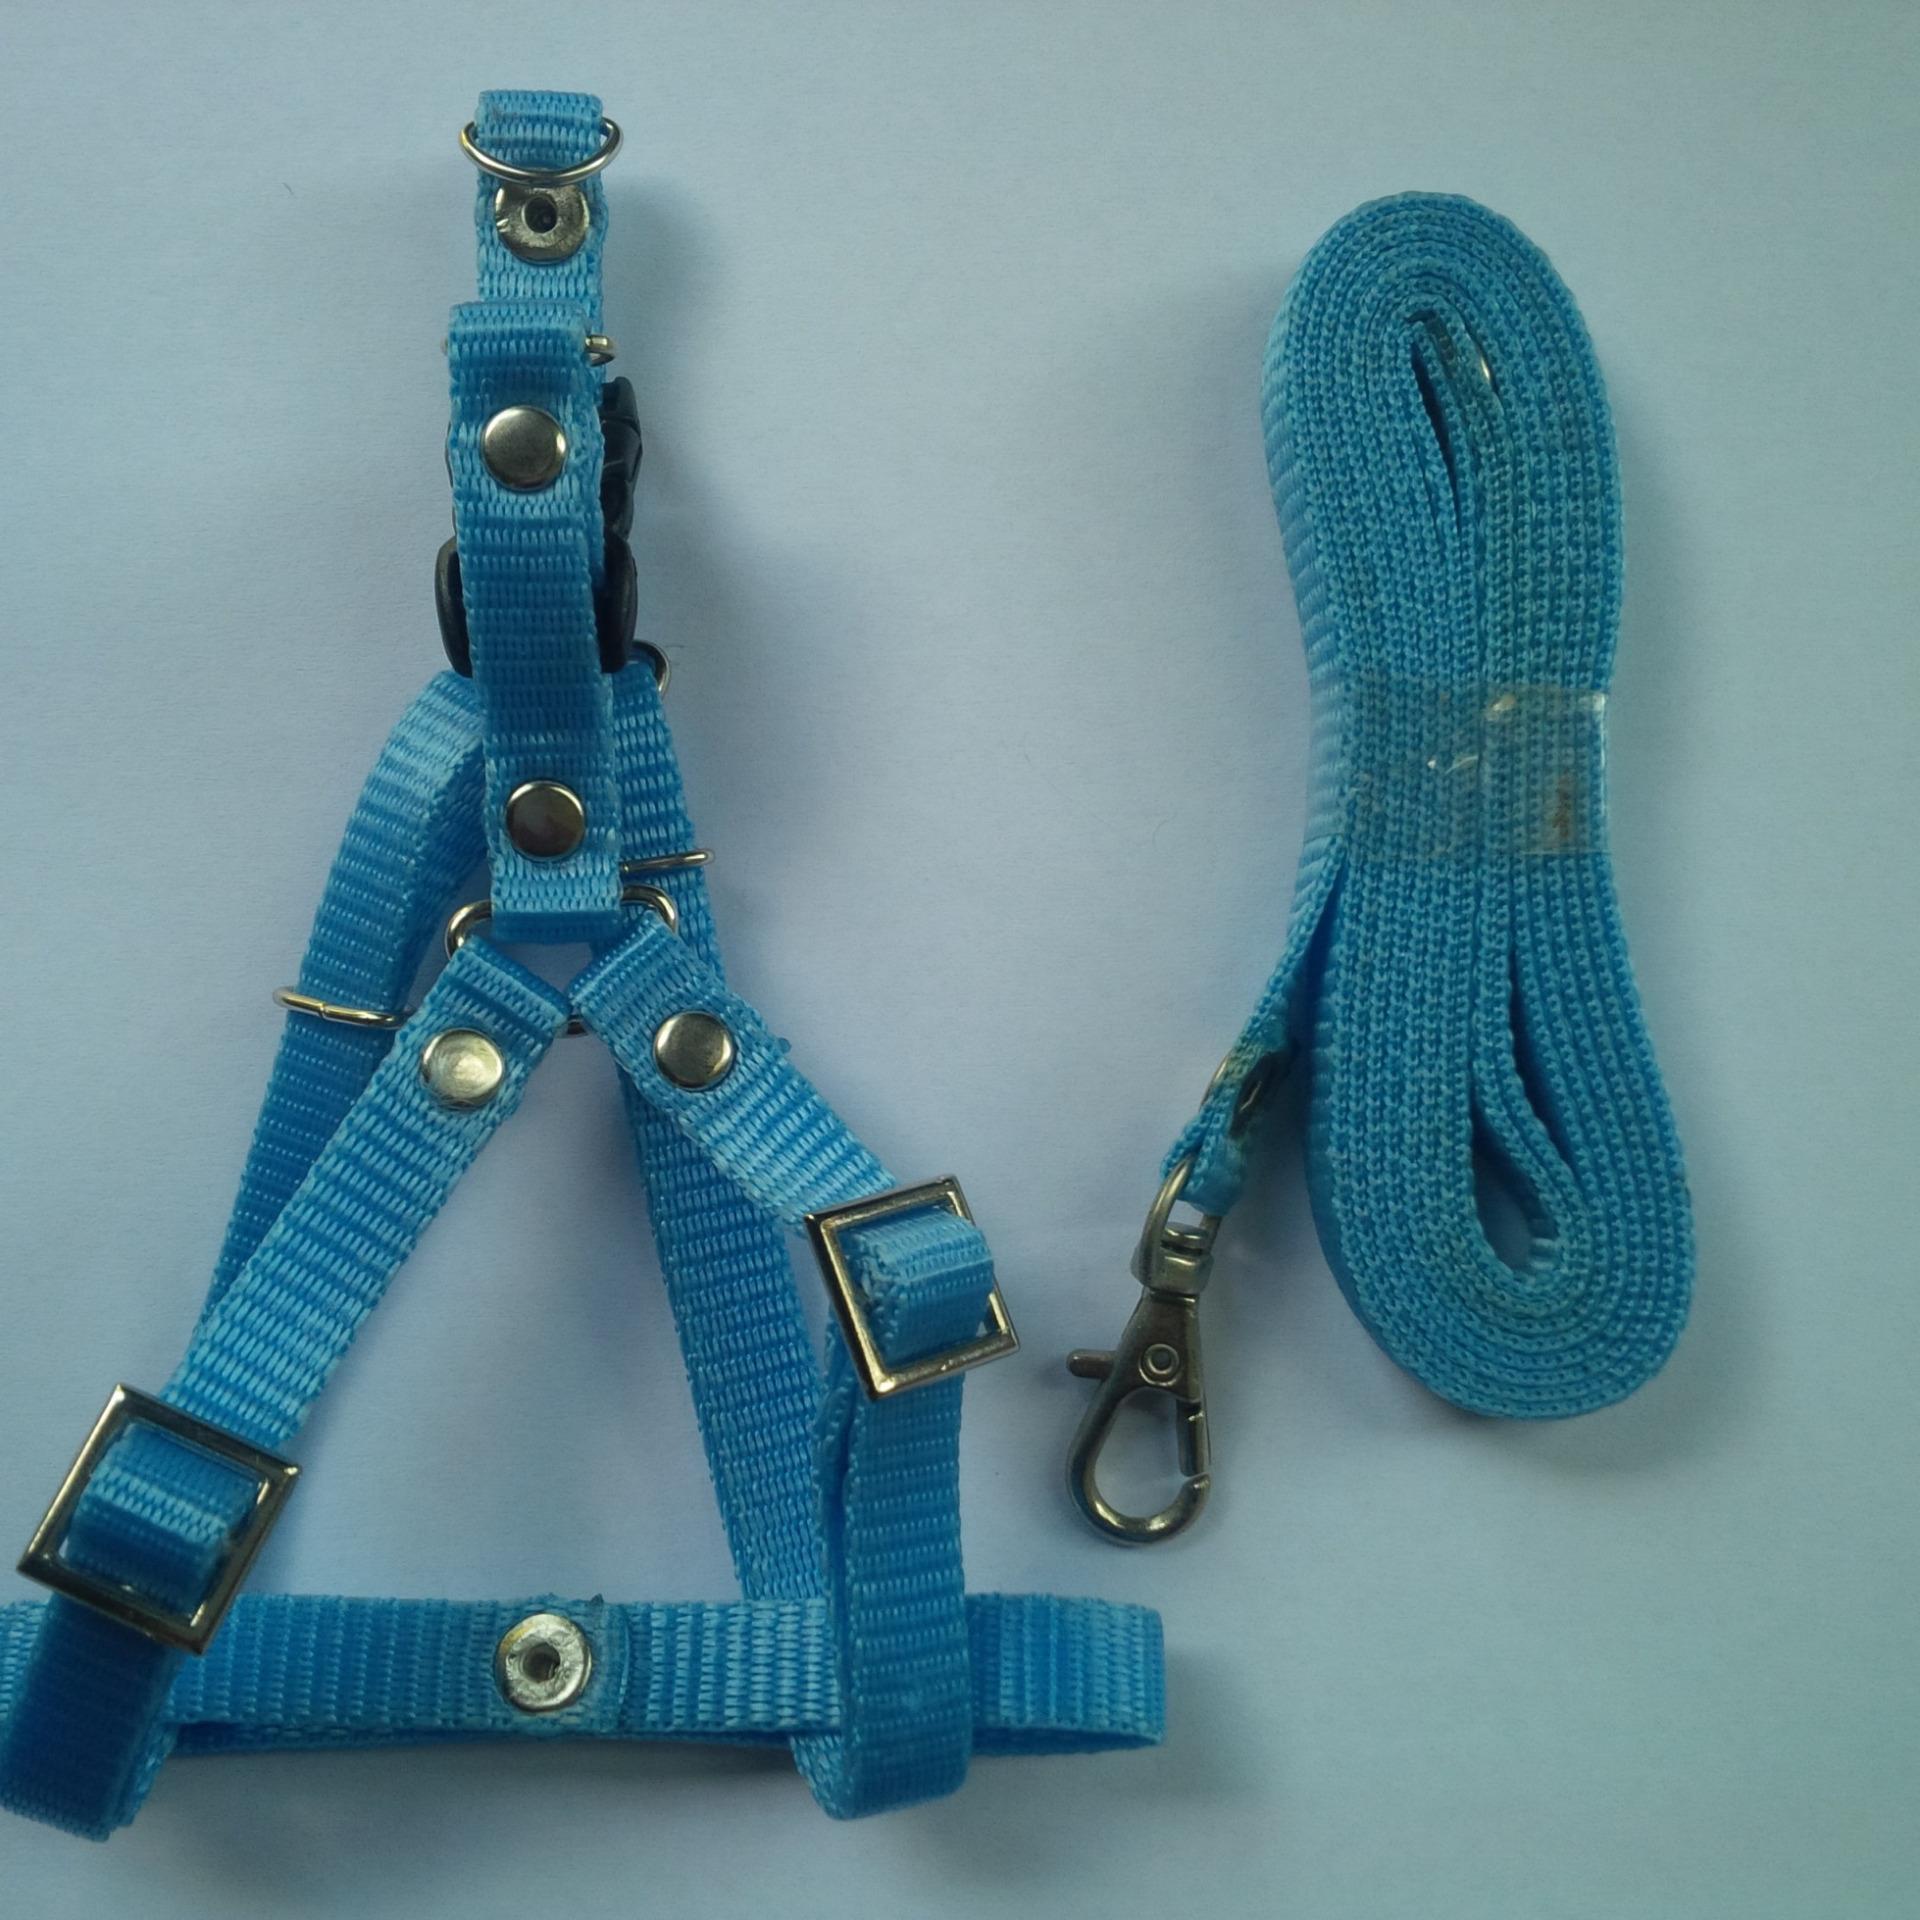 ... Harness Y uk S Leash Biru Muda untuk Kucing Kelinci Musang Puppy